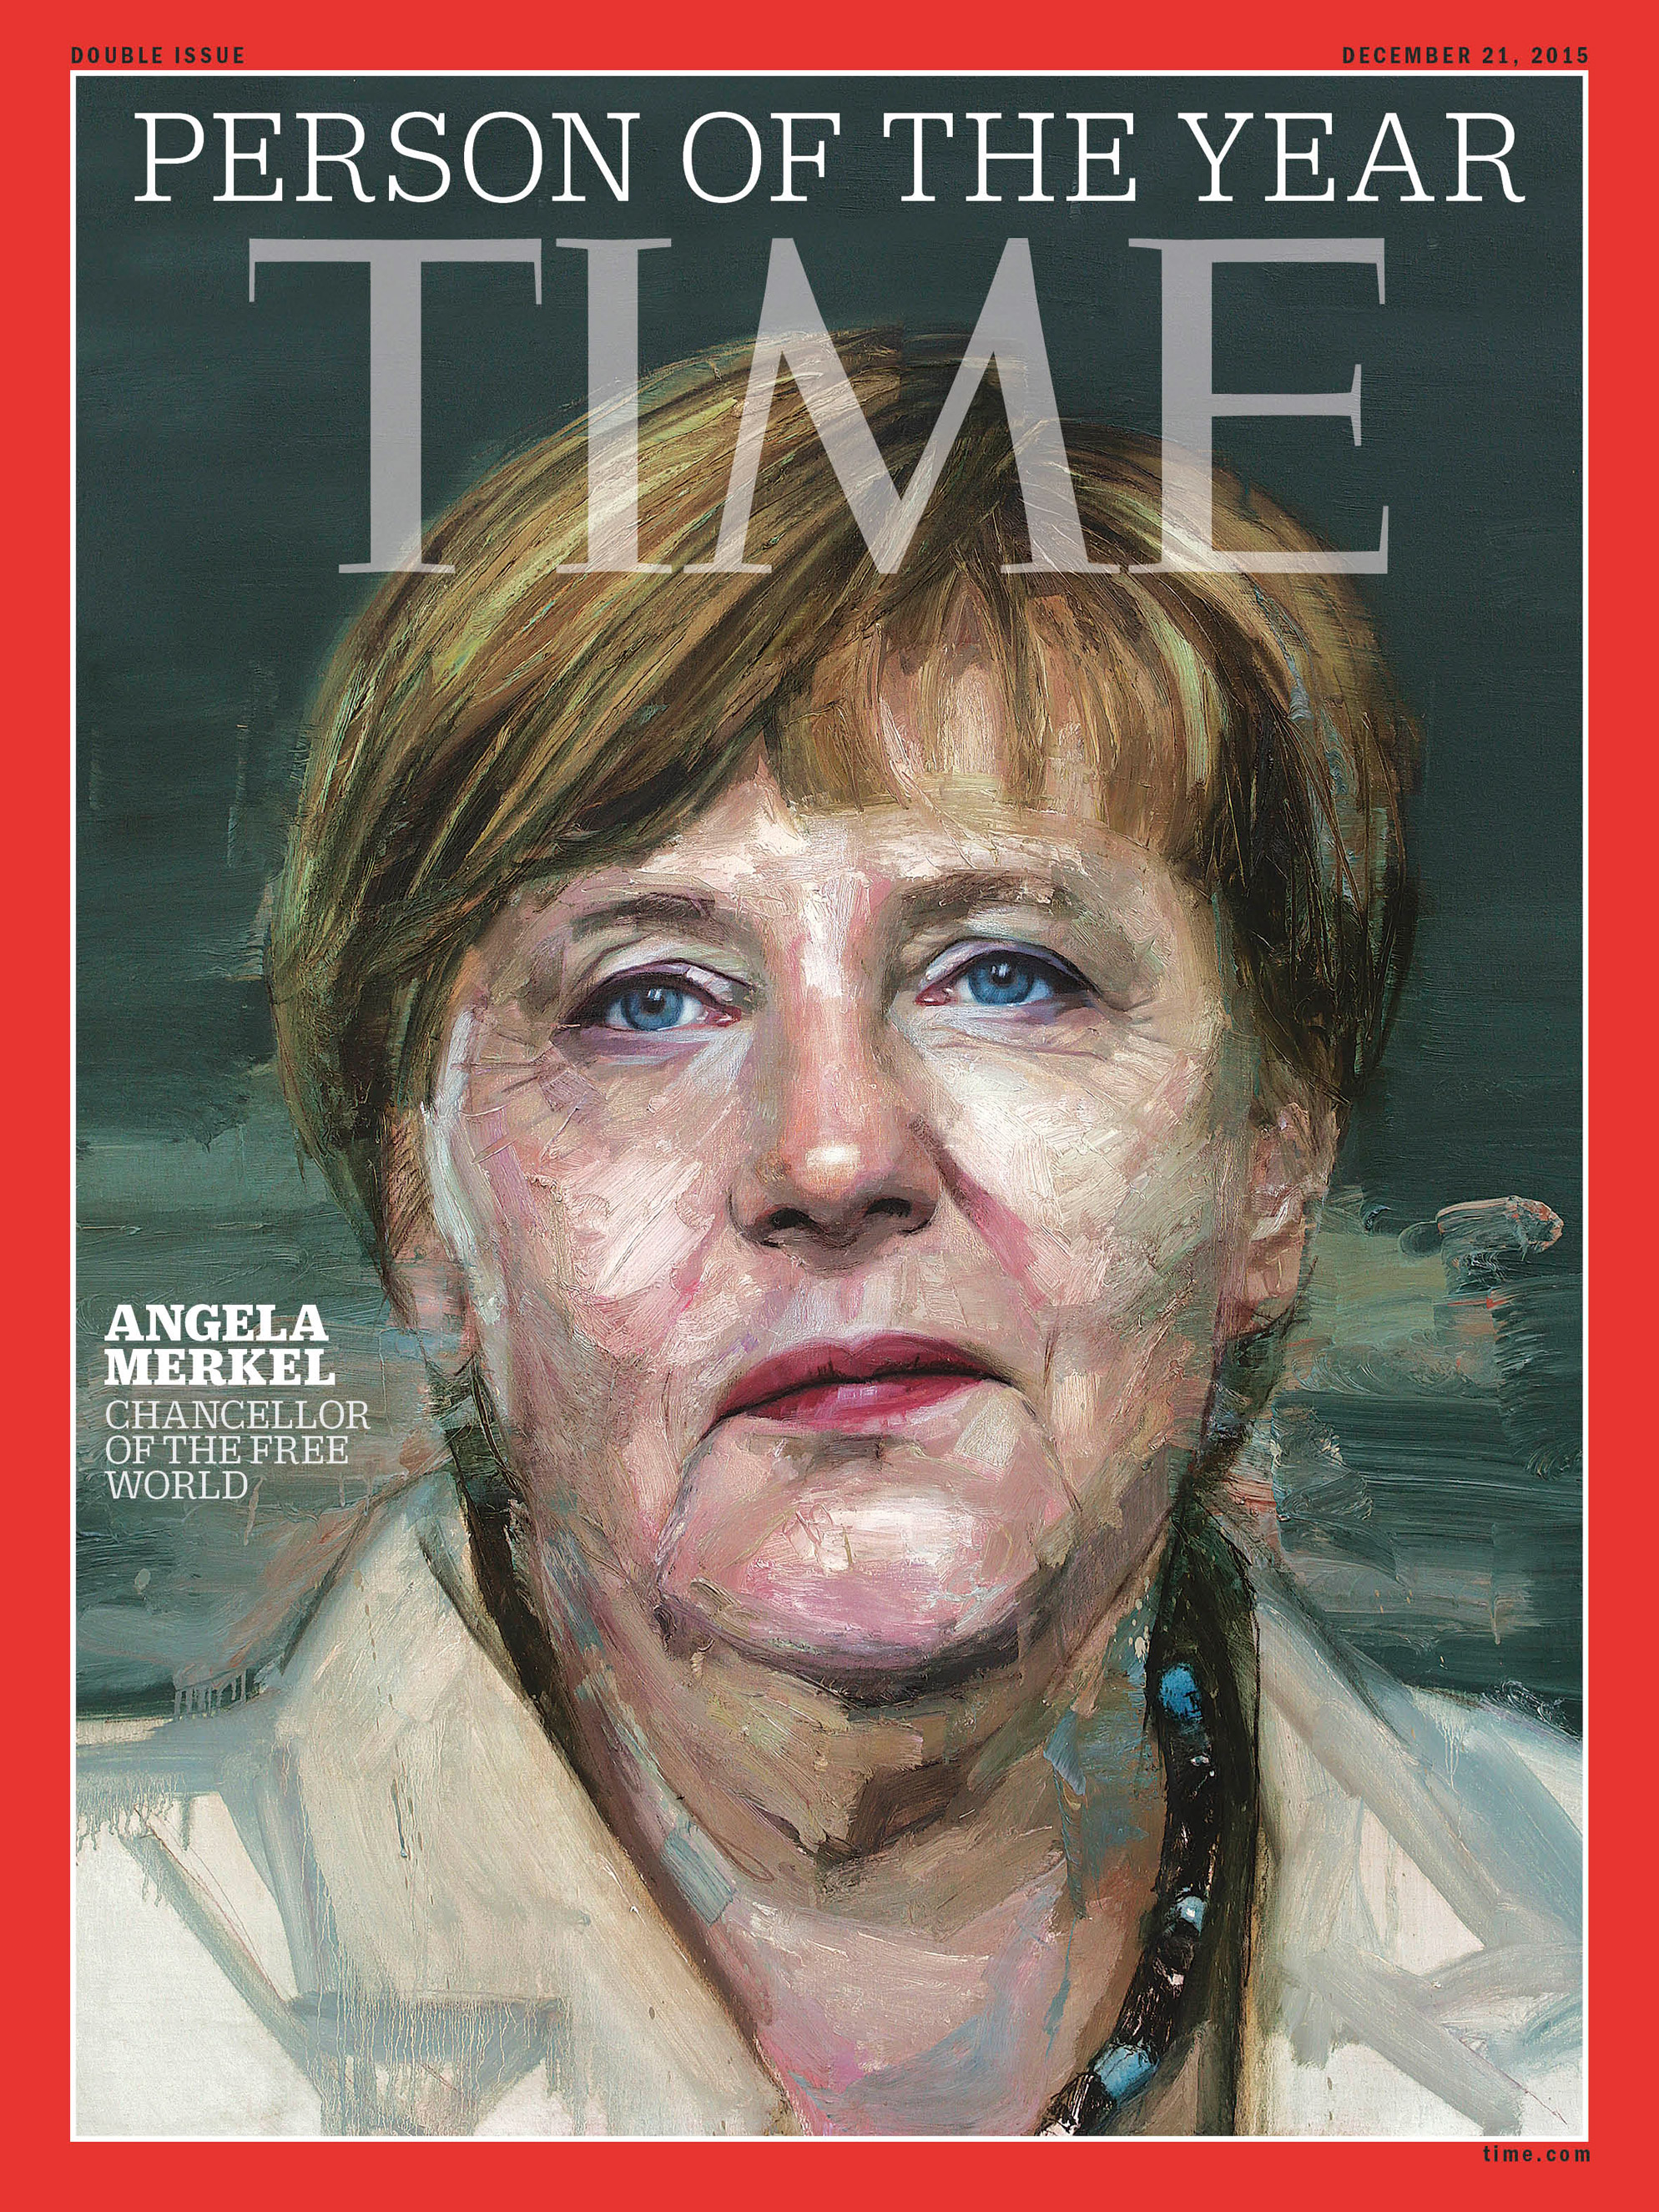 2015: Angela Merkel